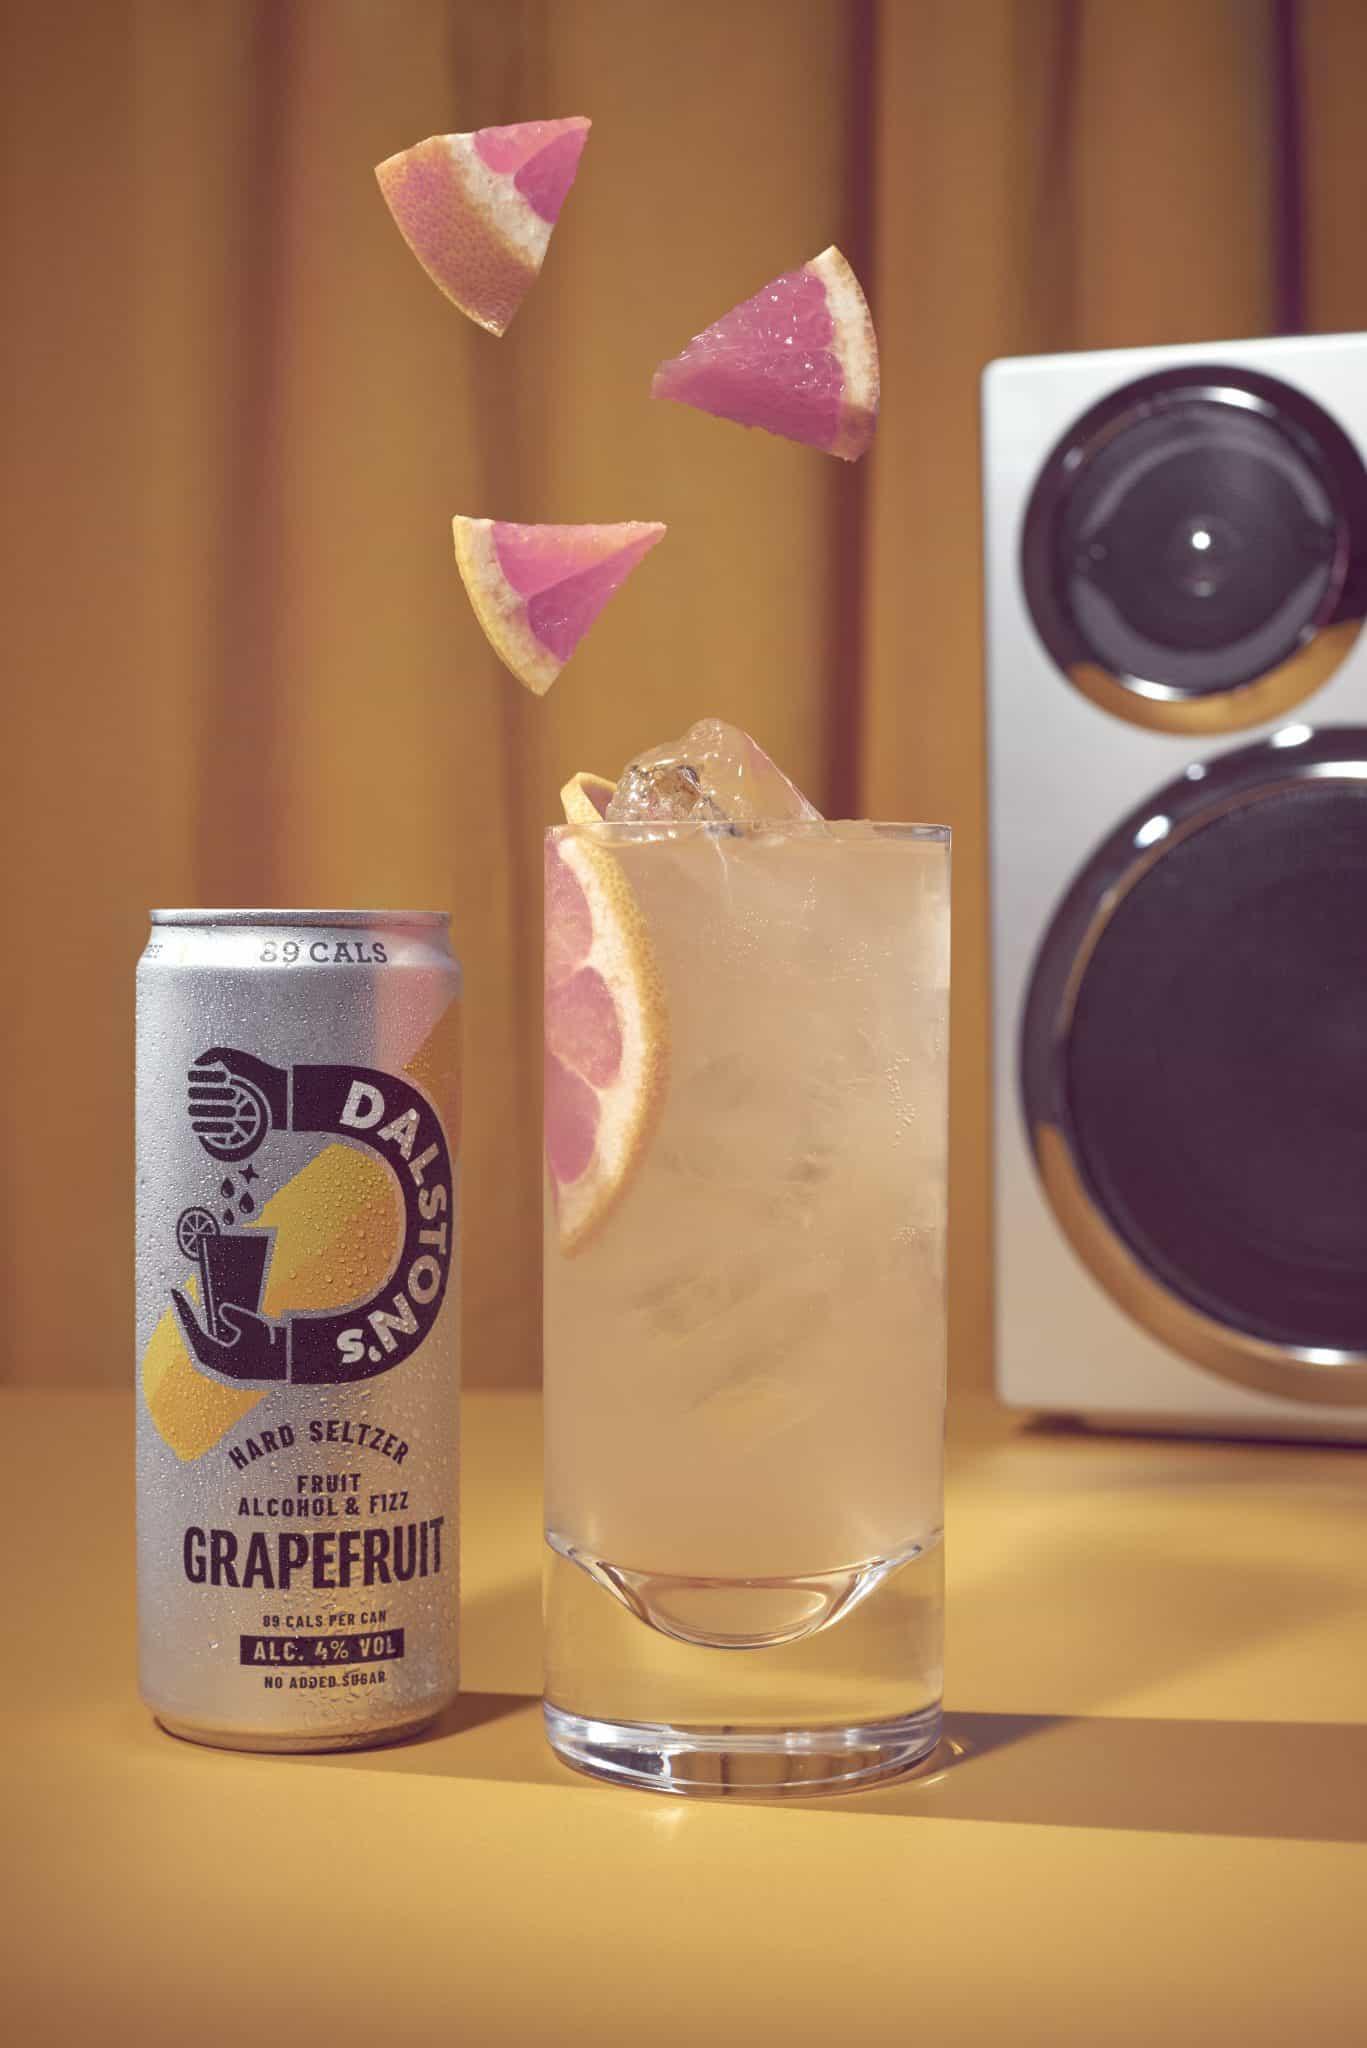 Dalston's Hard Seltzer Grapefruit